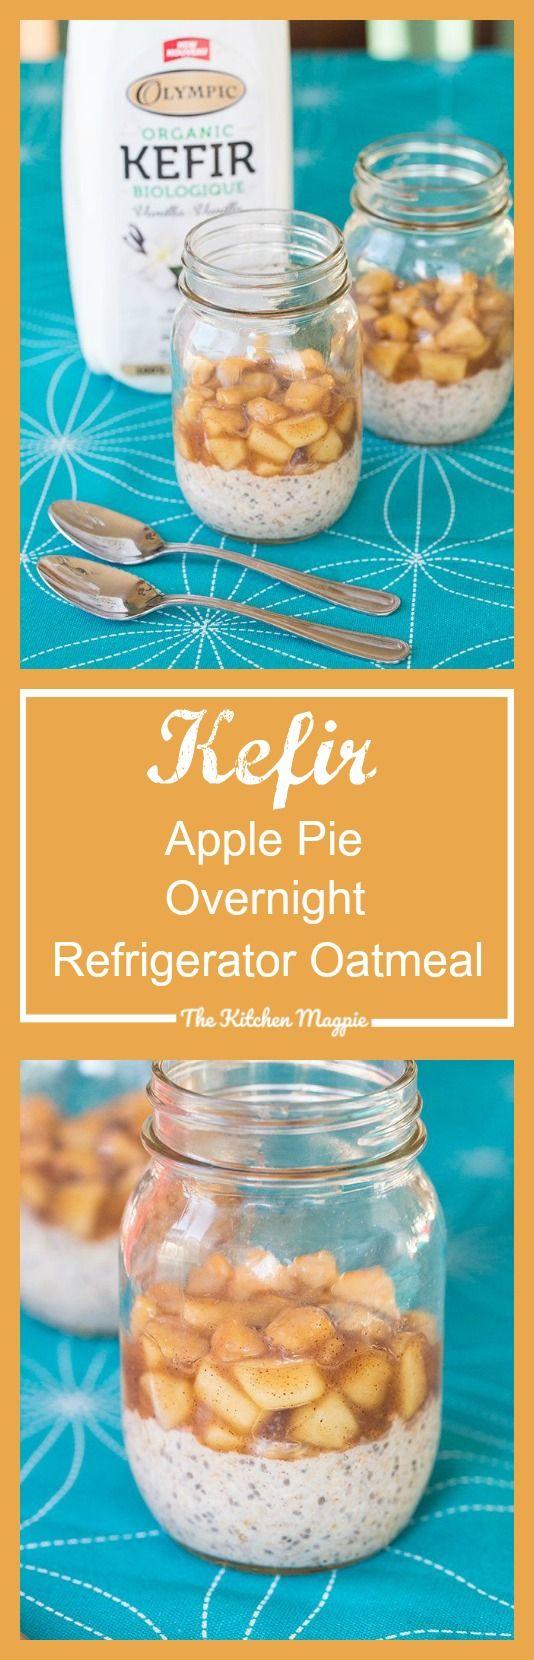 Kefir Apple Pie Overnight Refrigerator Oatmeal